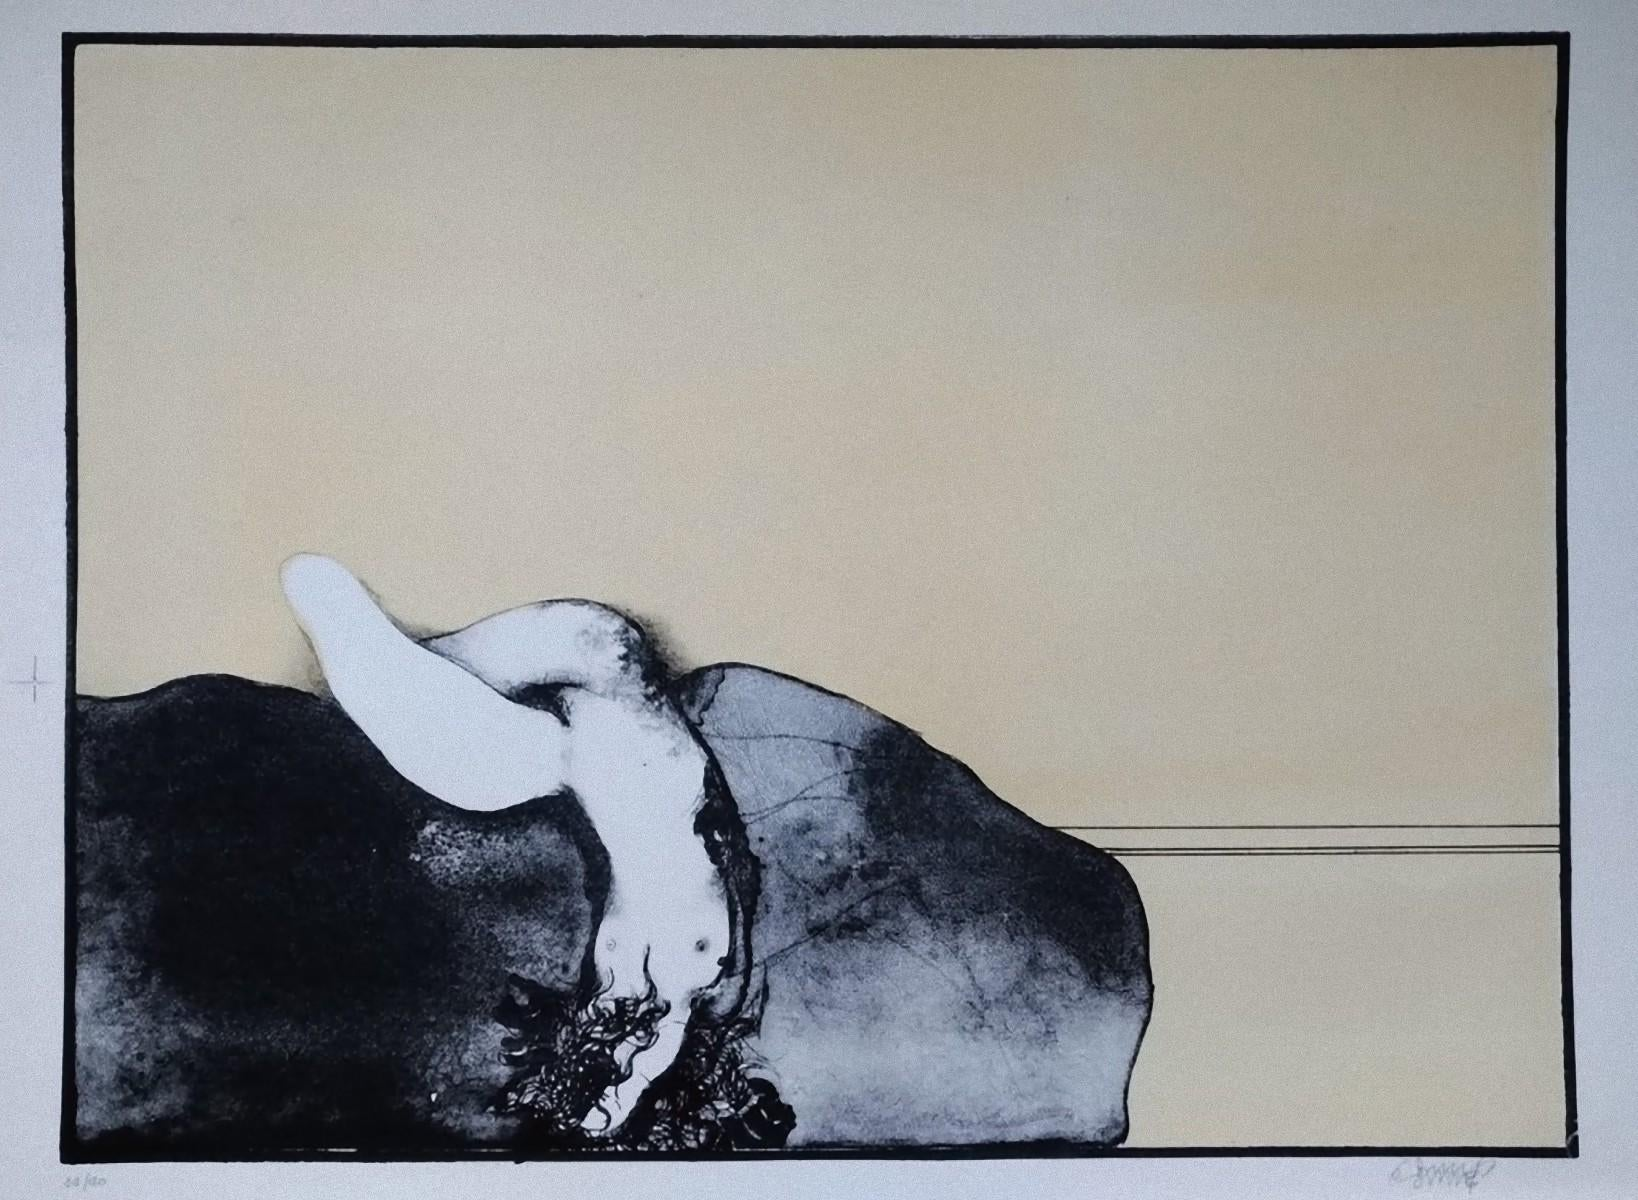 Nude - Original Lithograph by Bruno Bruni - 1968